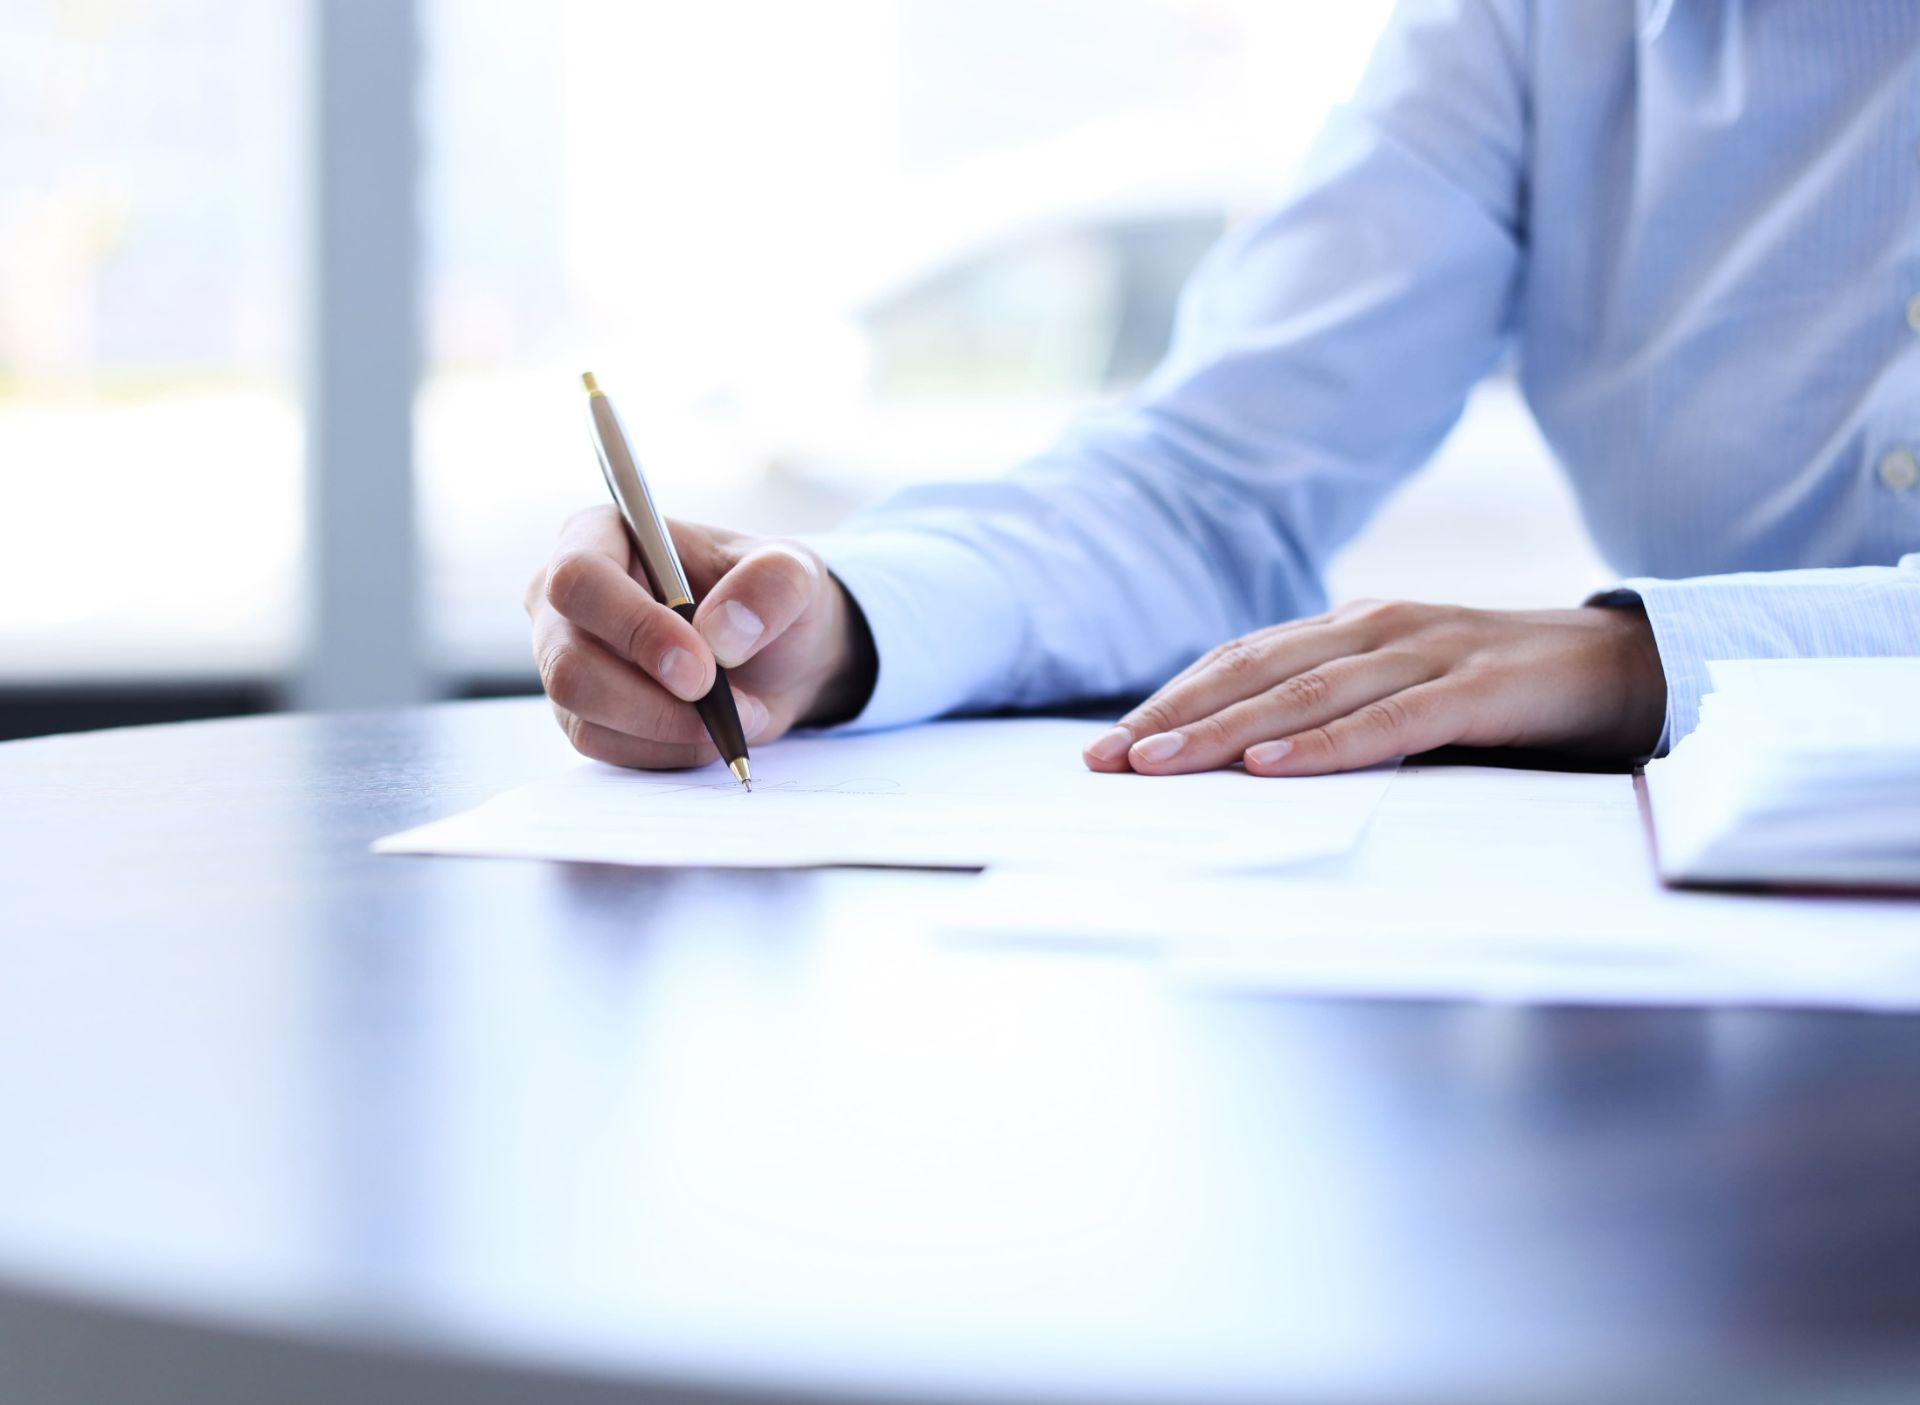 Businesswoman Sitting Office Desk Signing 600w 203485126